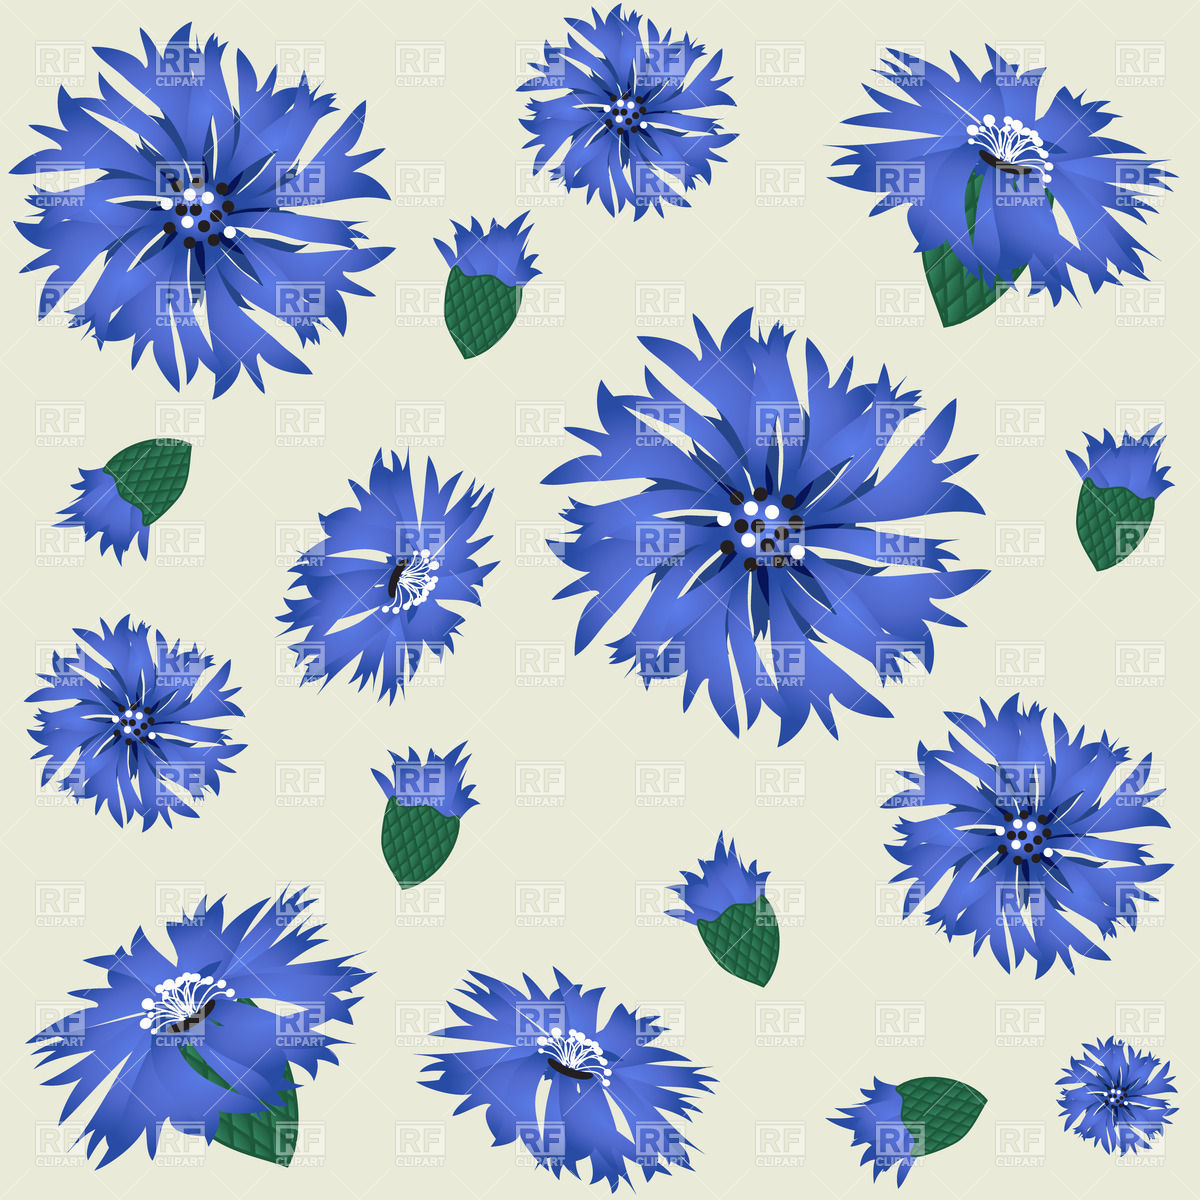 Cartoon isolated cornflowers Vector Image #24403.